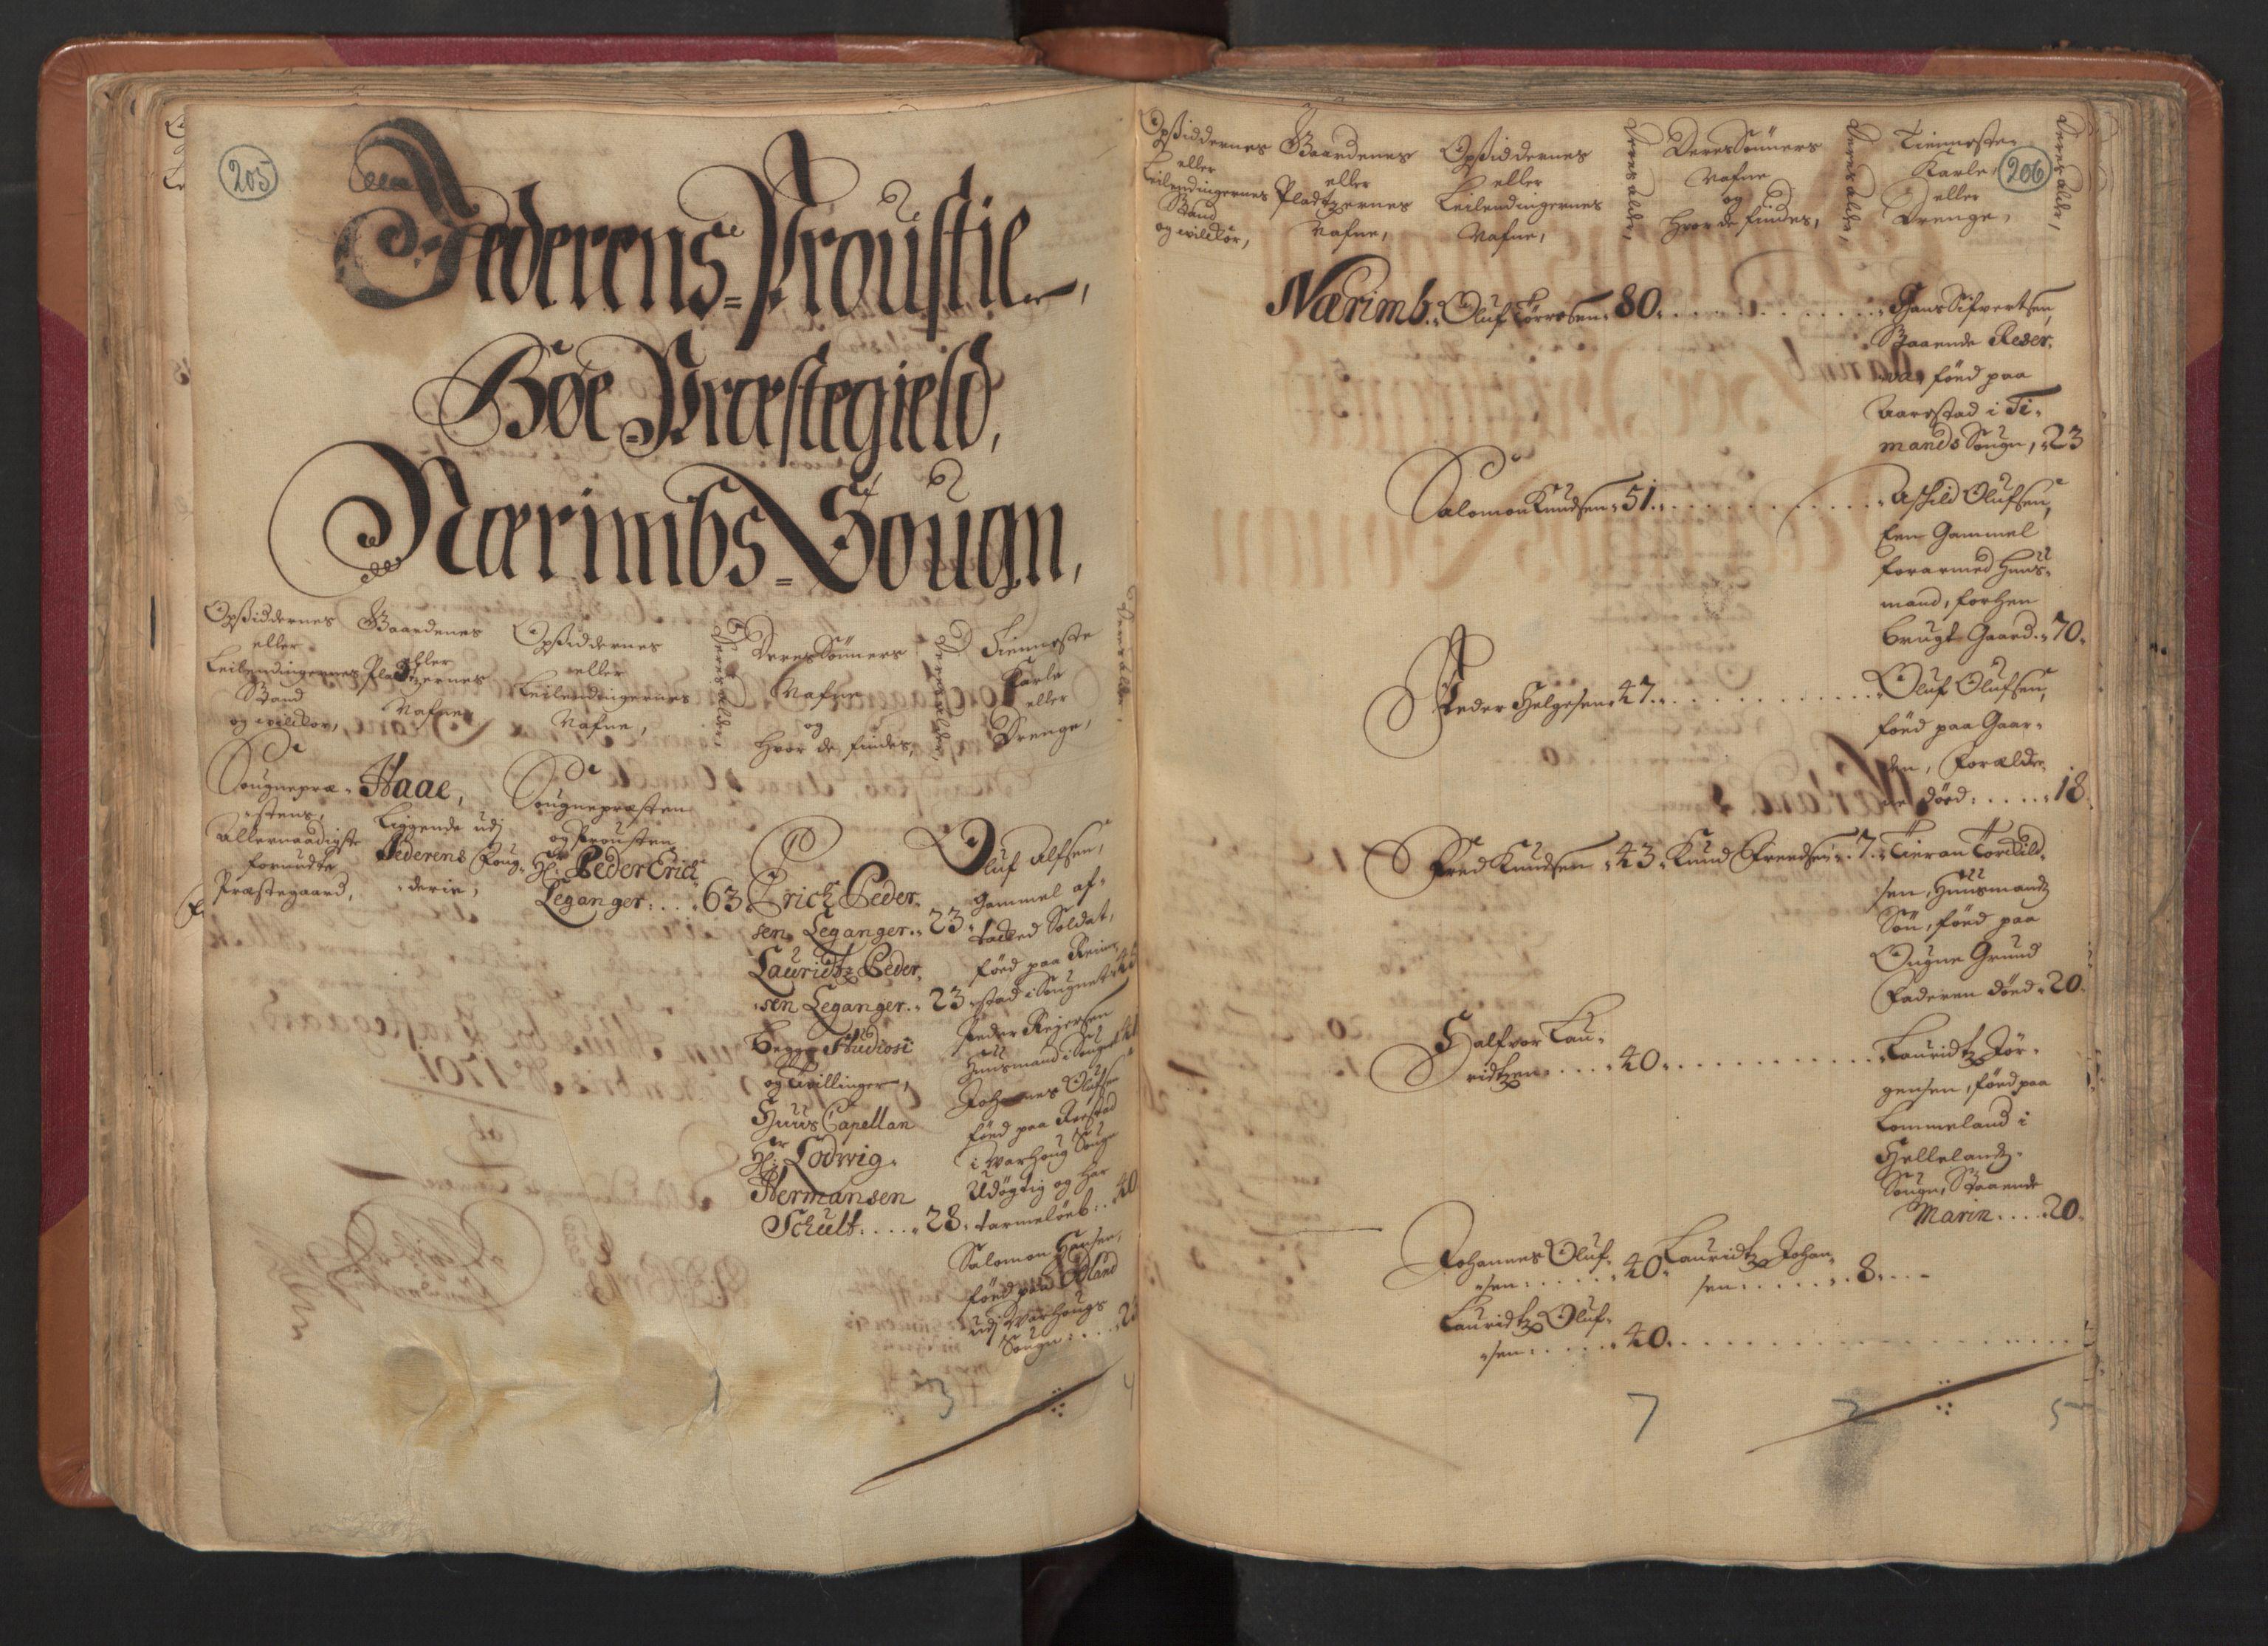 RA, Manntallet 1701, nr. 4: Jæren og Dalane fogderi, 1701, s. 205-206